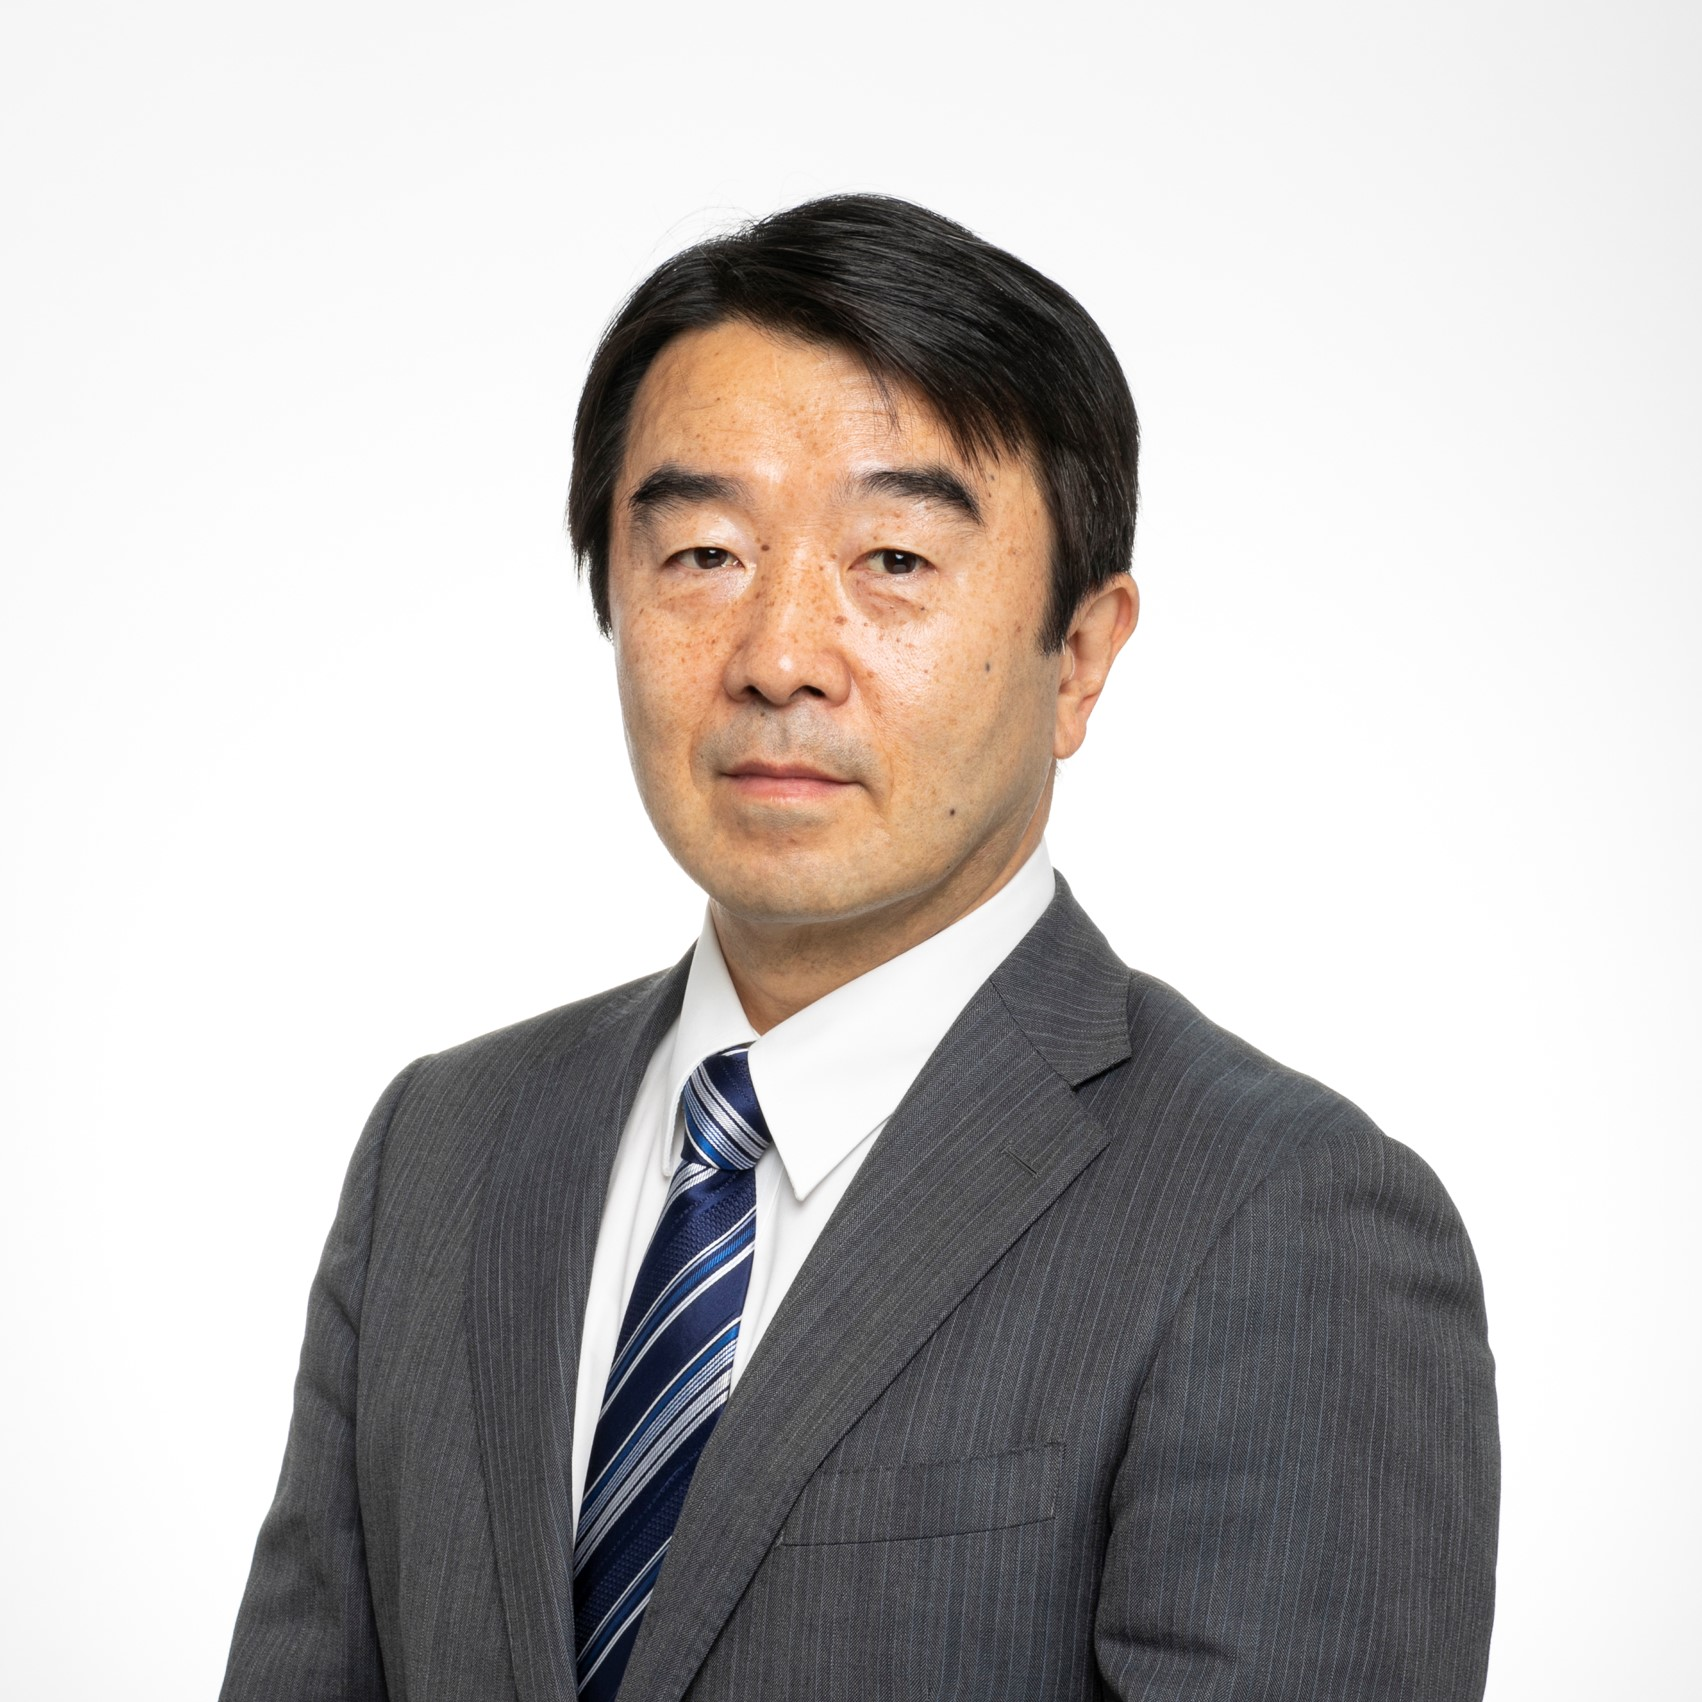 Kichio UEHARA